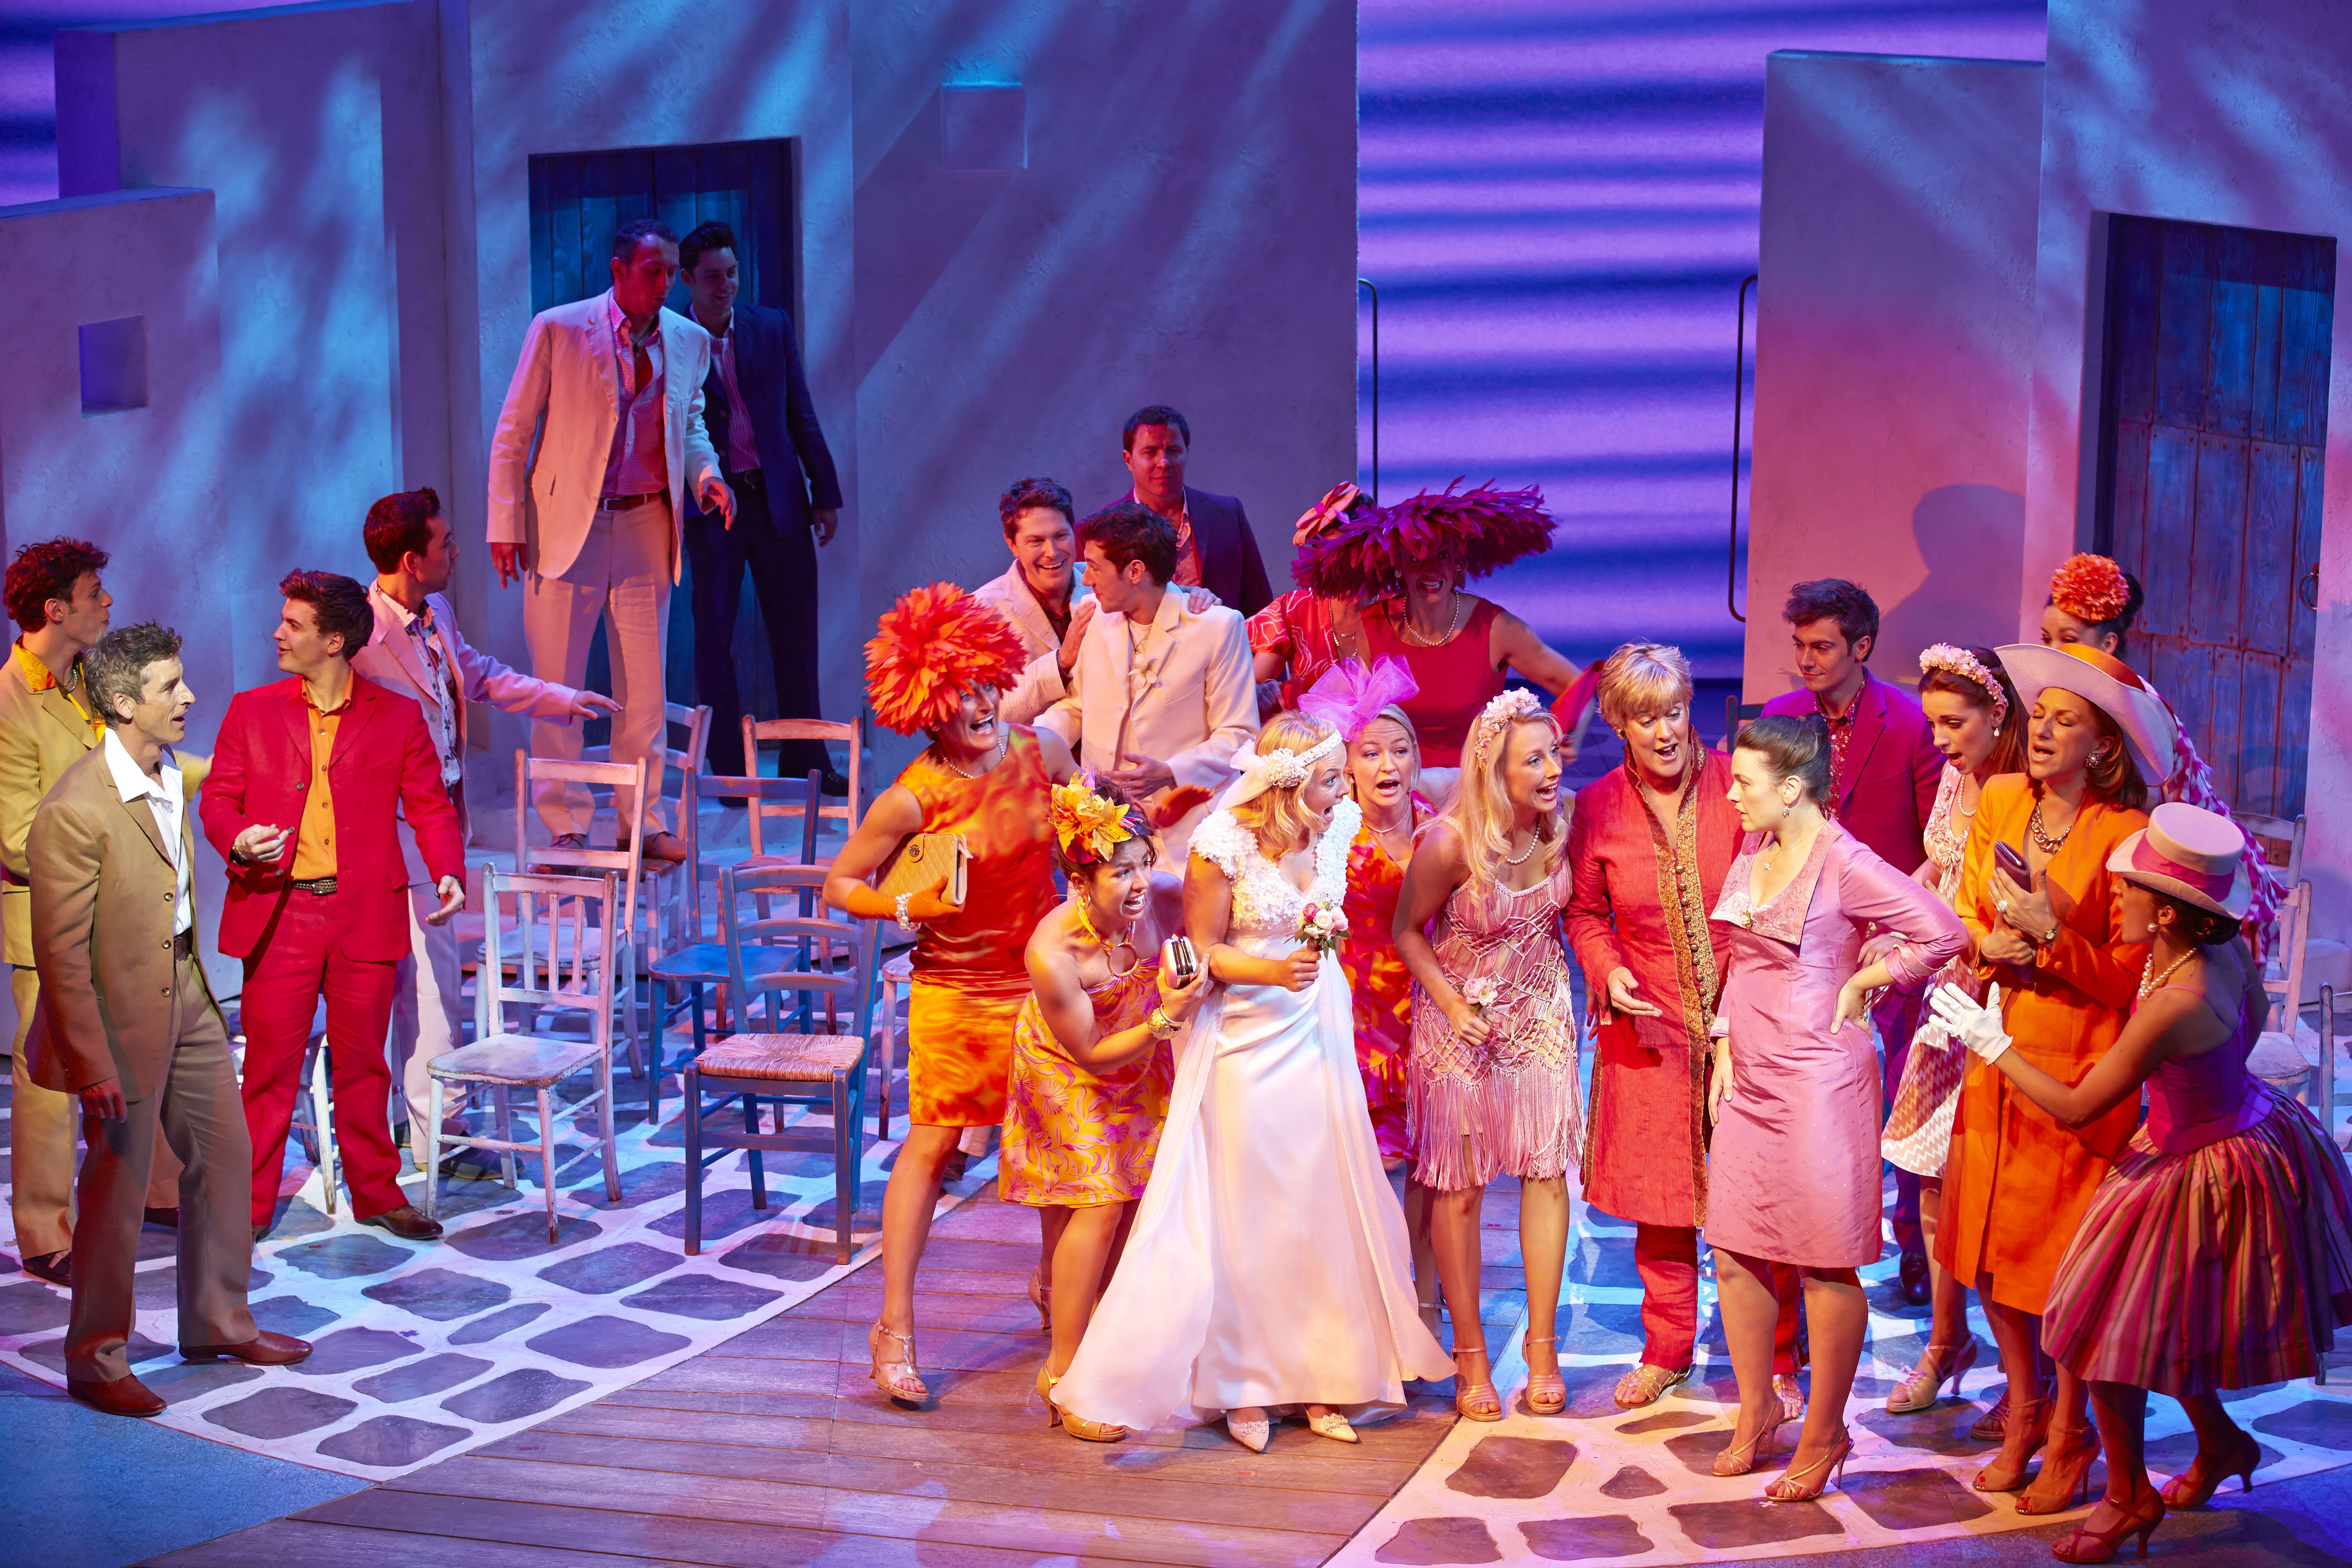 Mamma Mia Novello Theatre Image West End Cast Of Mamma Mia Credit Brinkhoff Mogenburg Http Www Londonmacadam Com